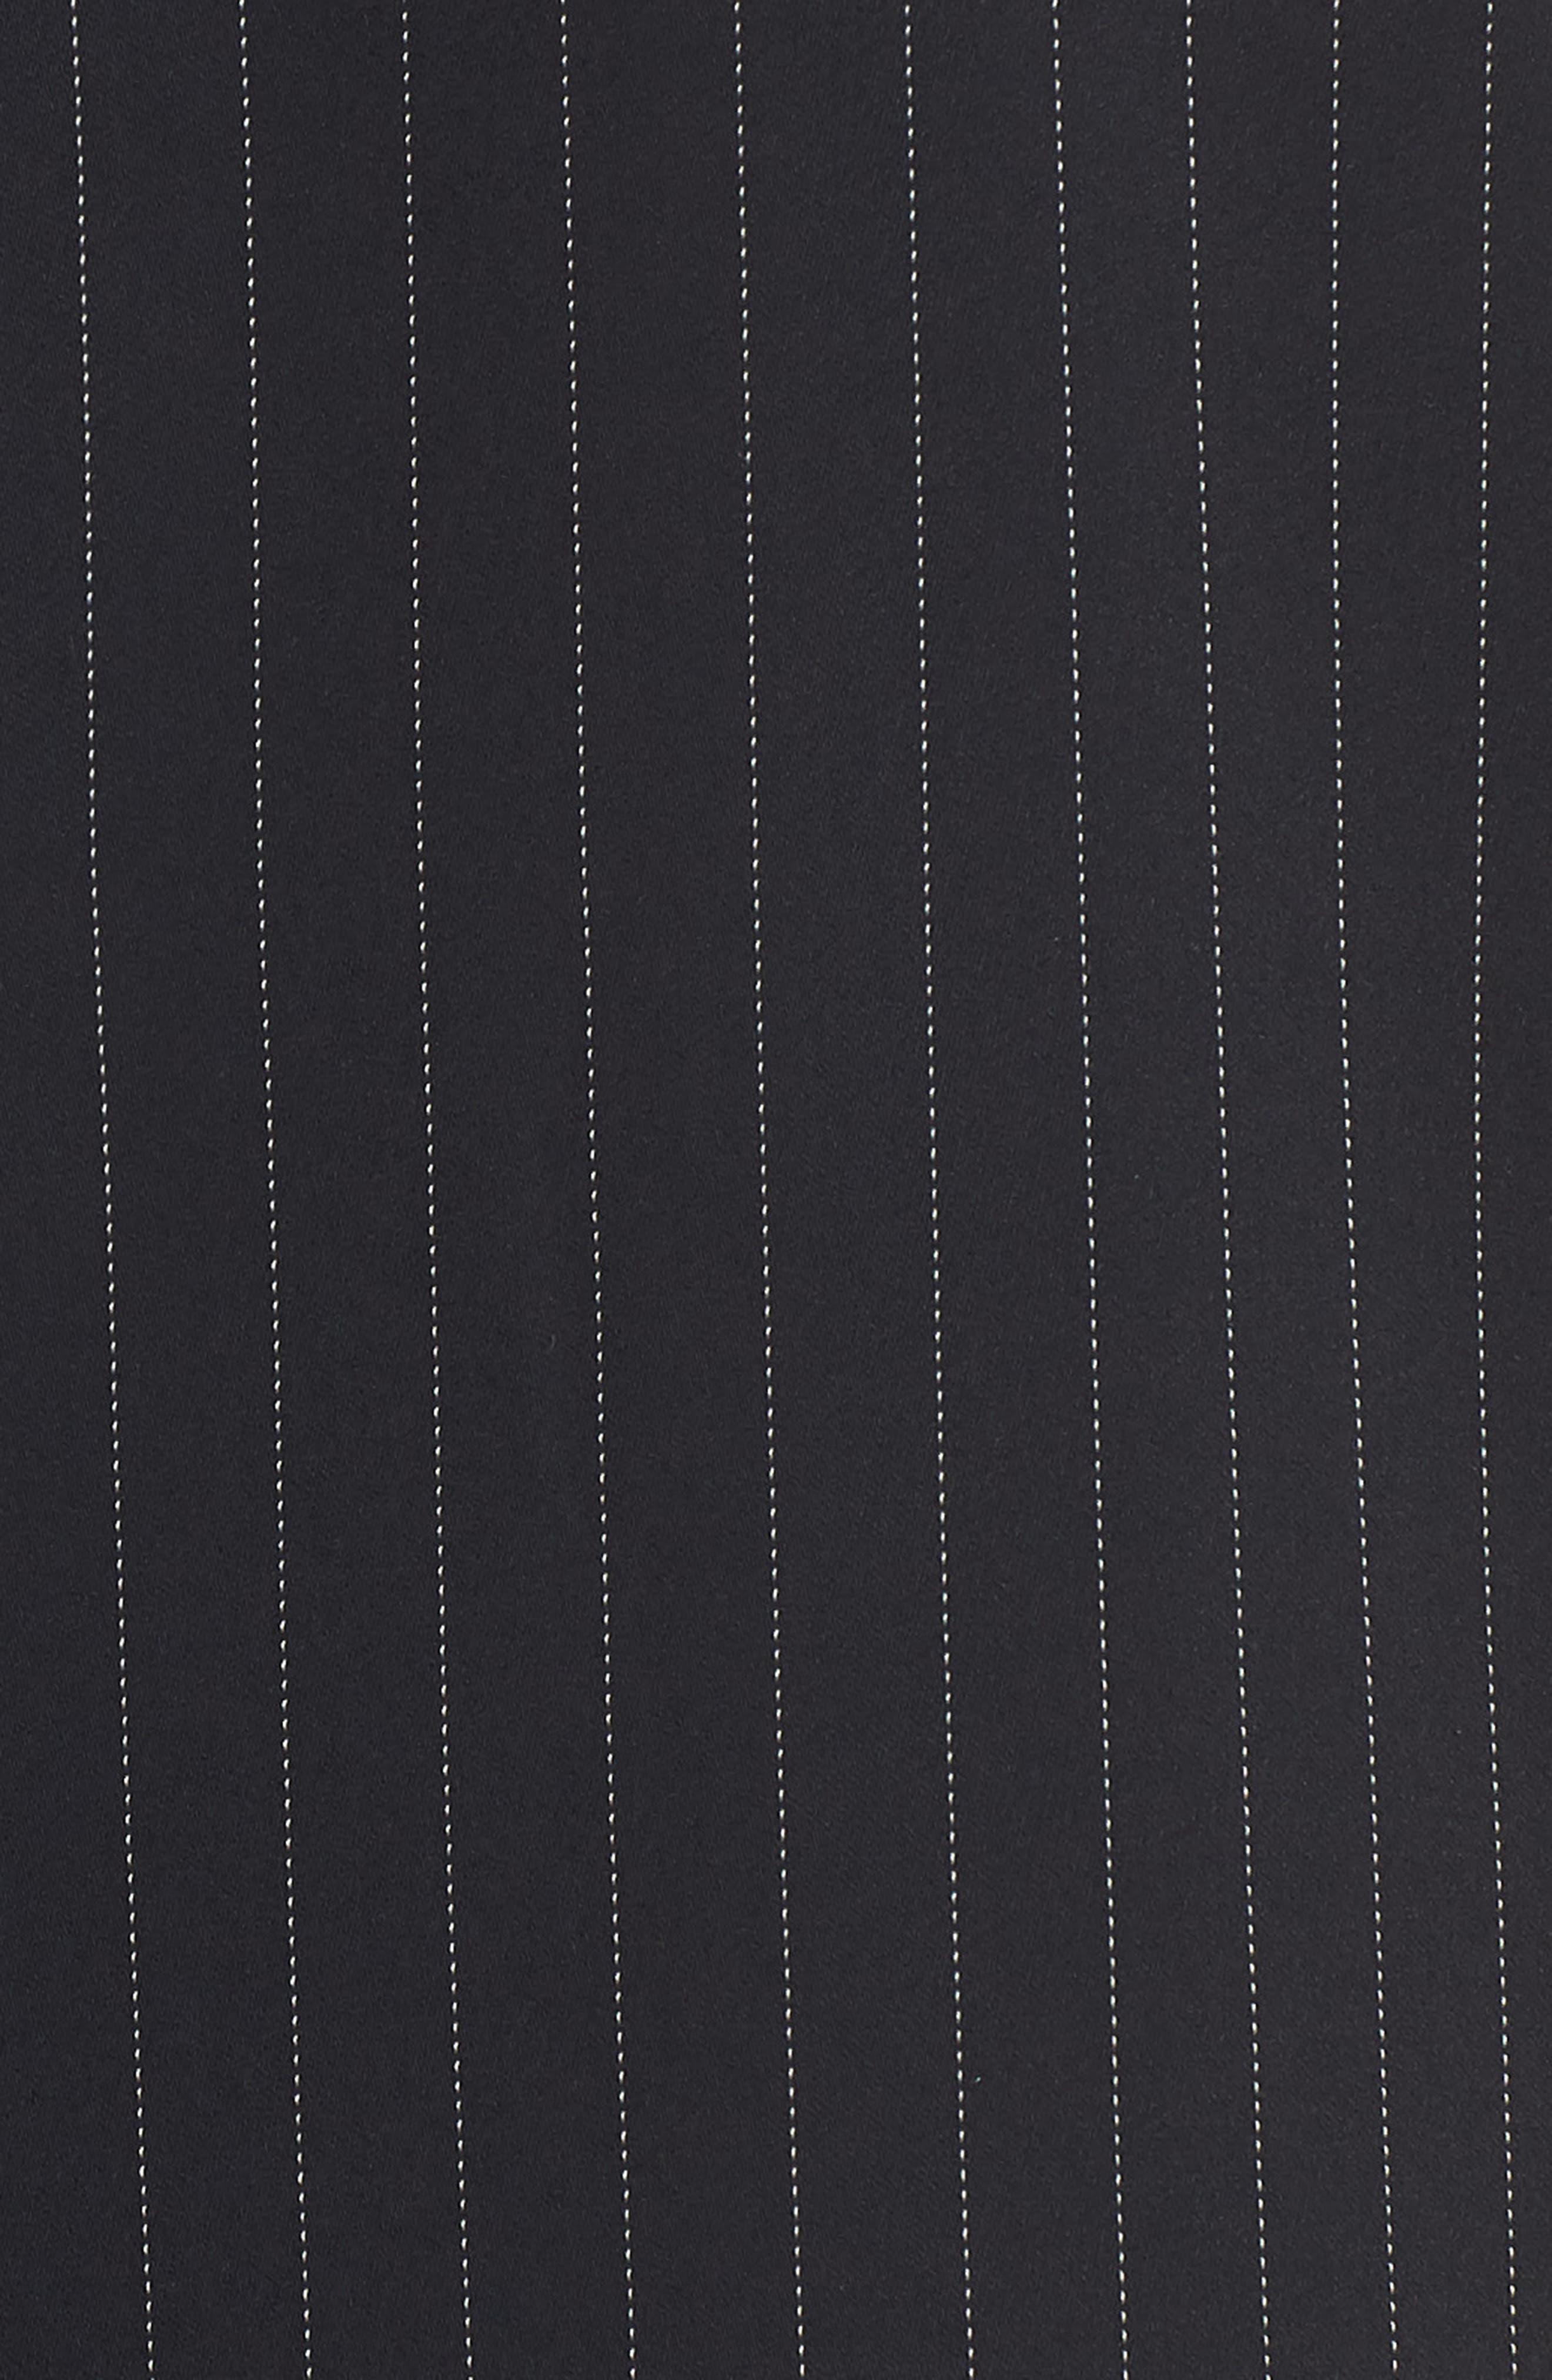 Crop Jumpsuit,                             Alternate thumbnail 6, color,                             BLACK DOTTED PINSTRIPE